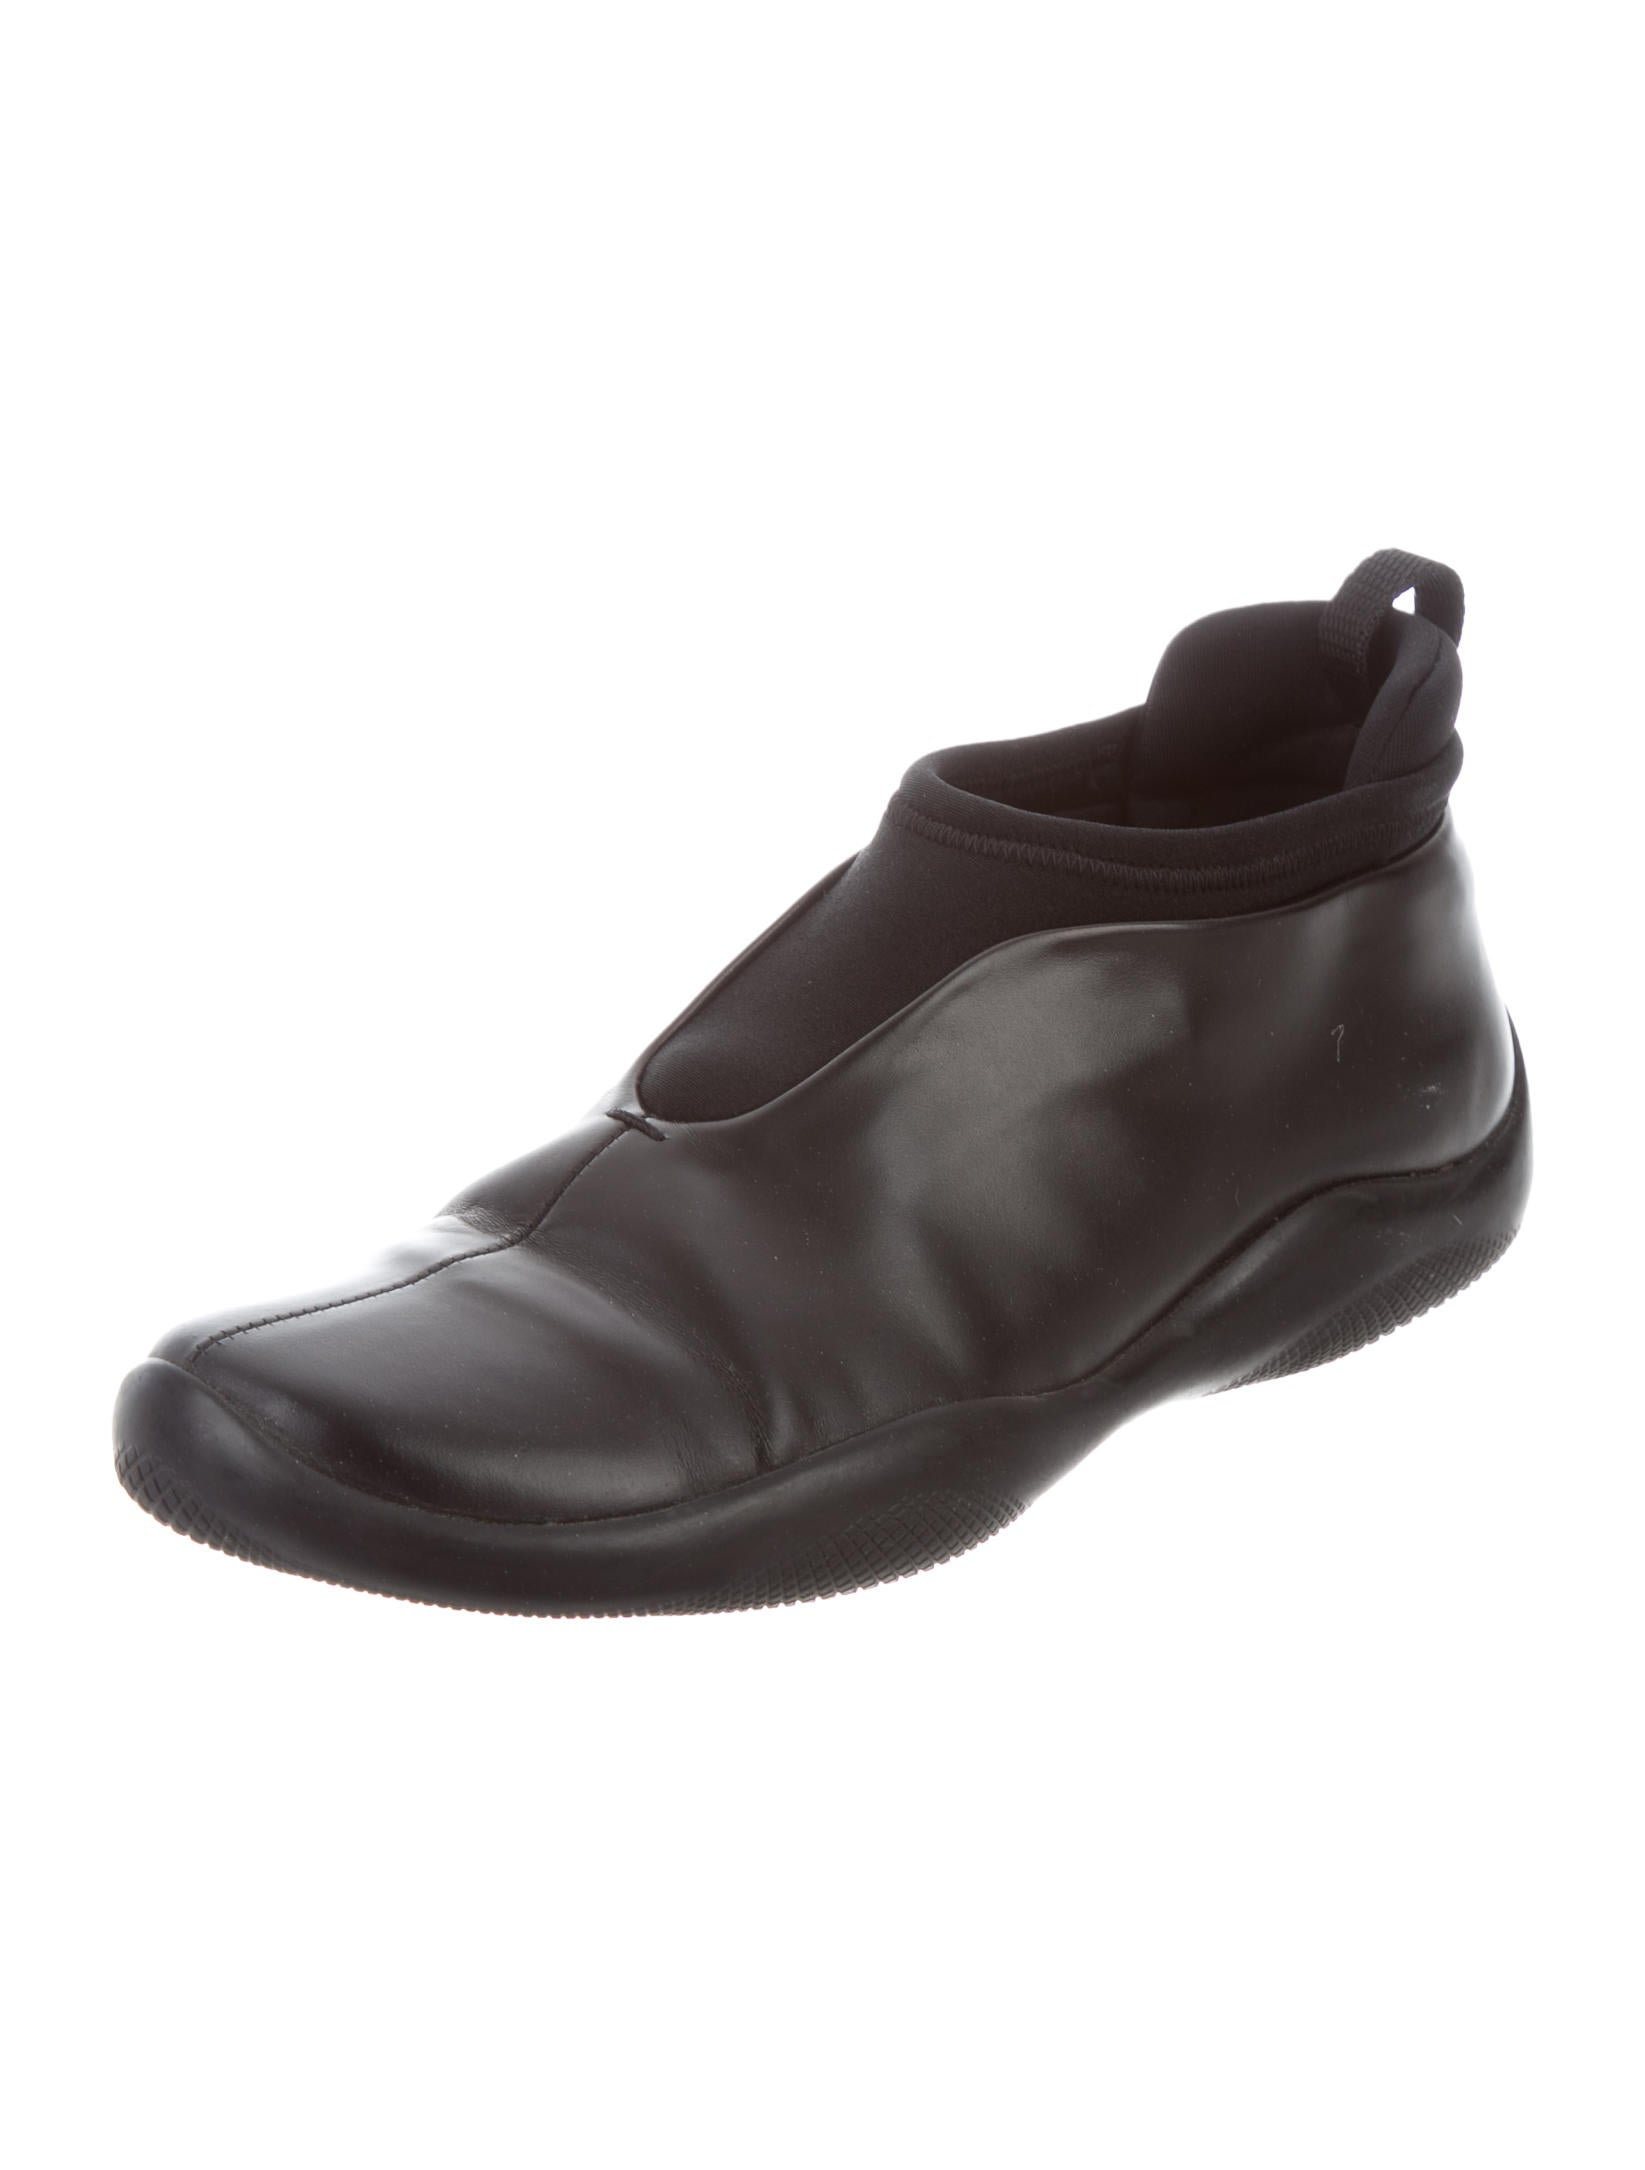 prada sport leather slip on sneakers shoes wpr40996